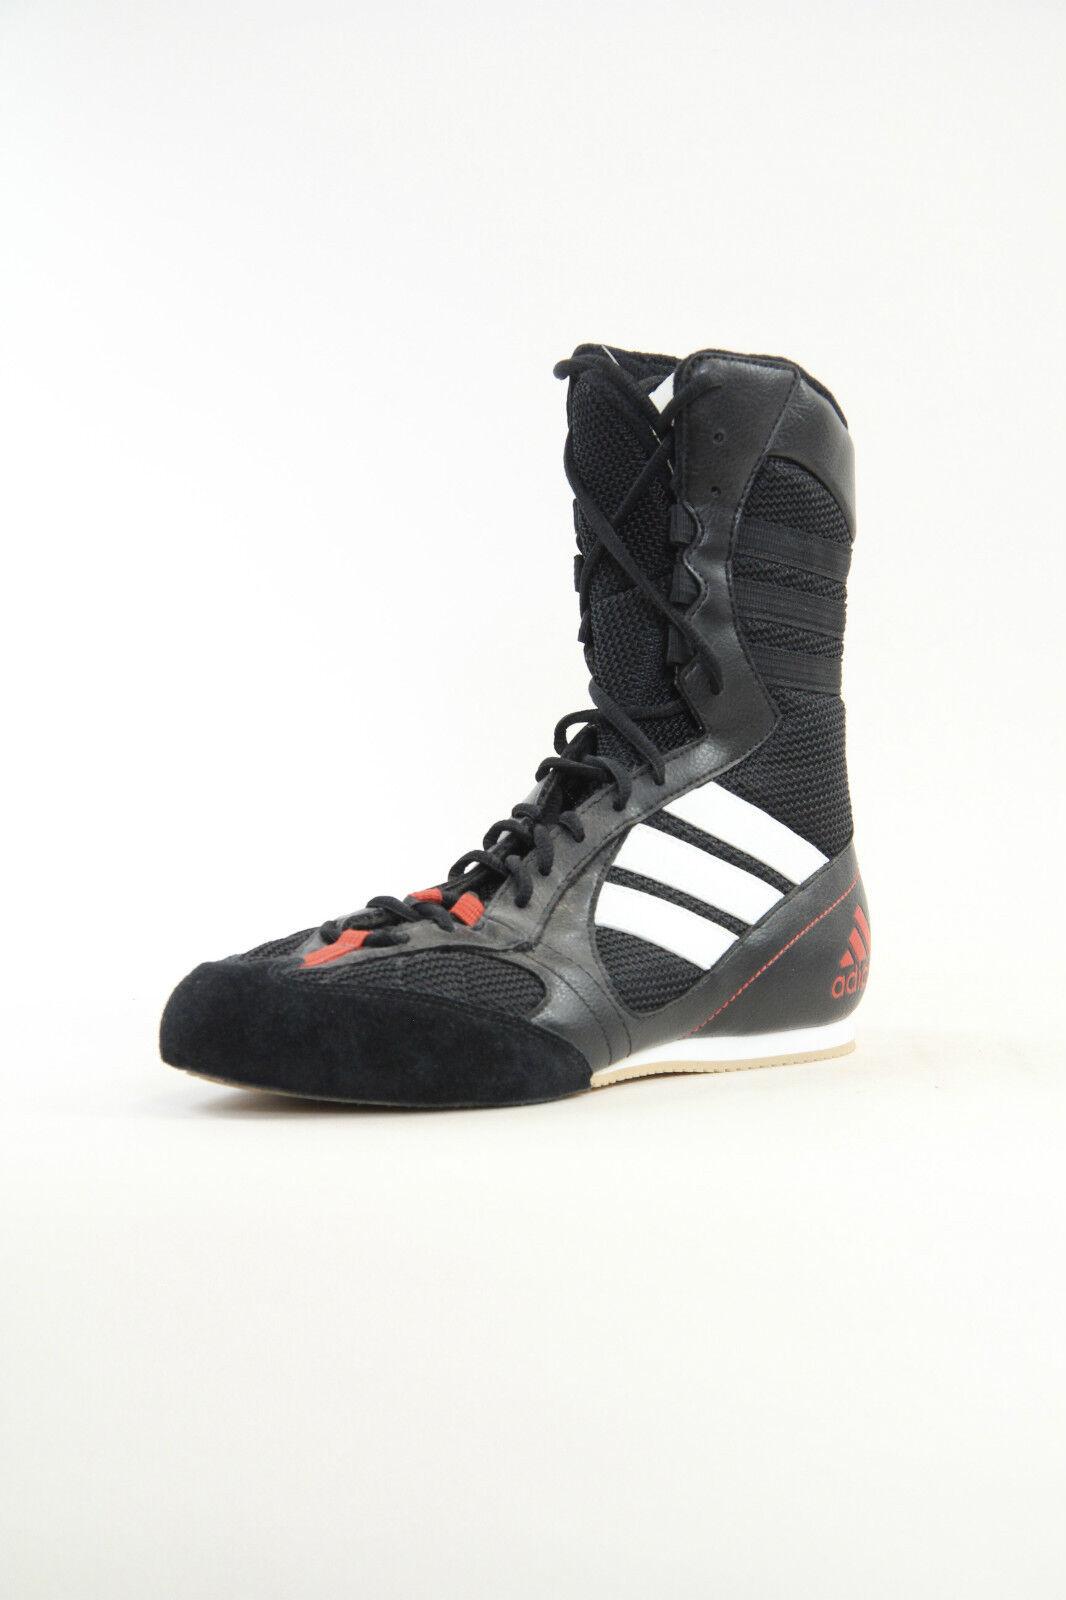 Adidas Tygun 665648 Boxing Bottes Noir